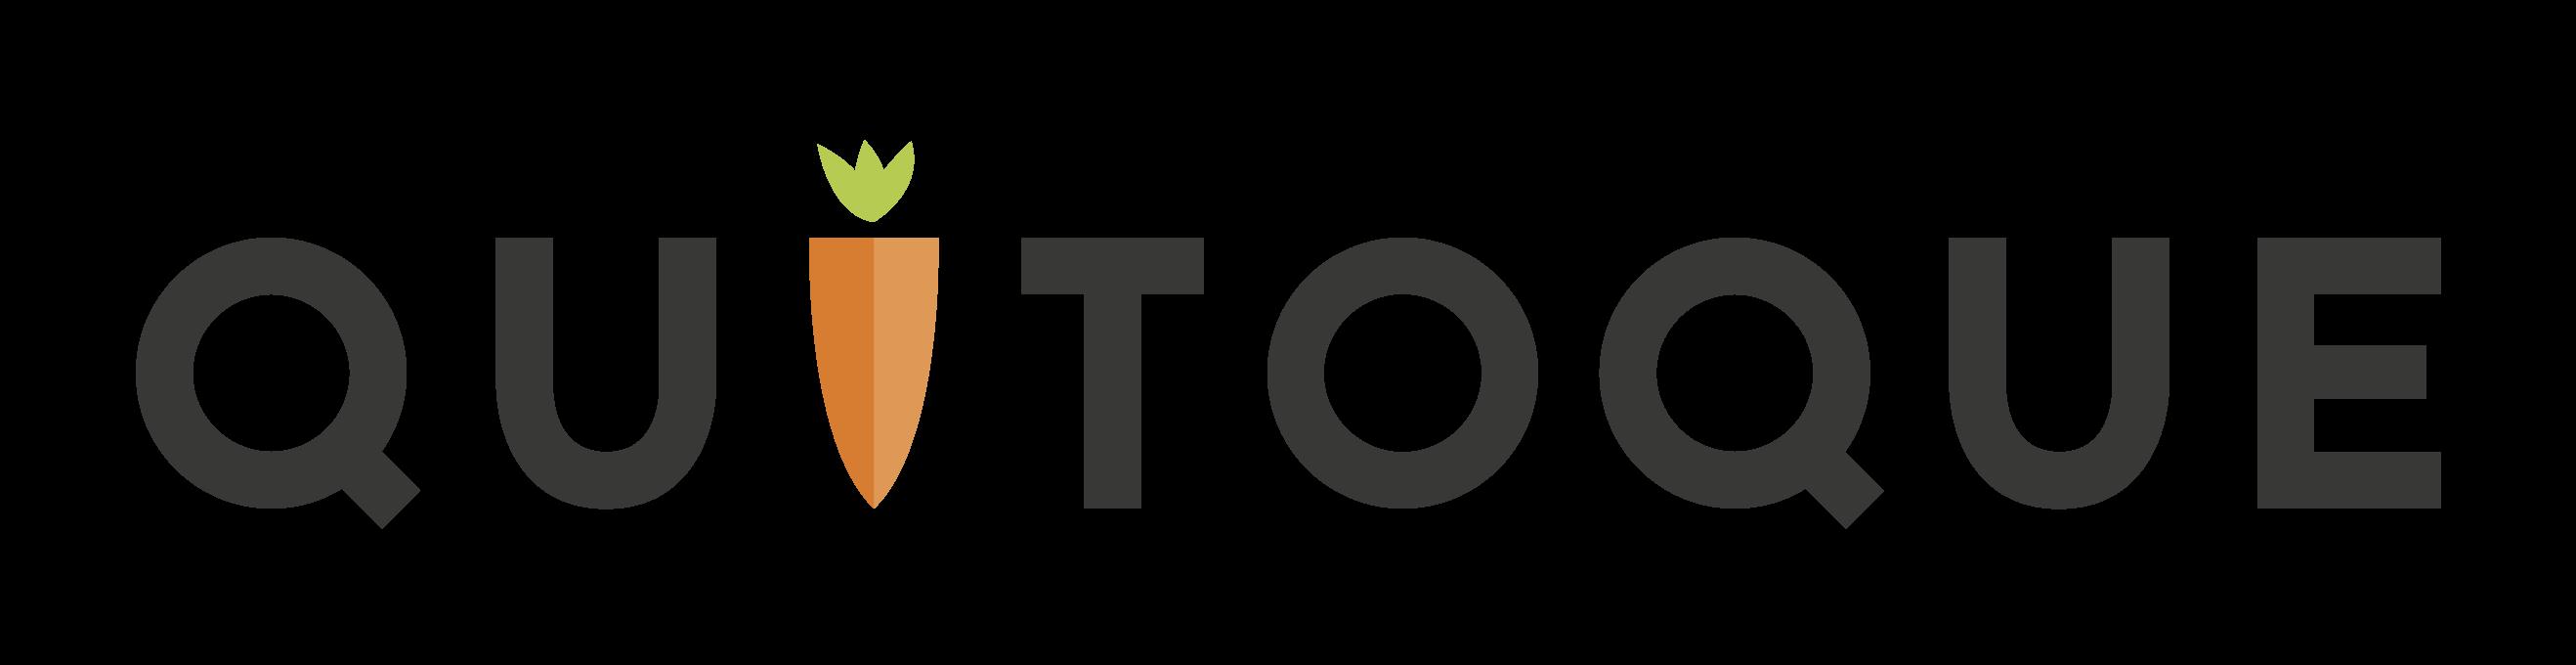 logo quitoque travail étudiant